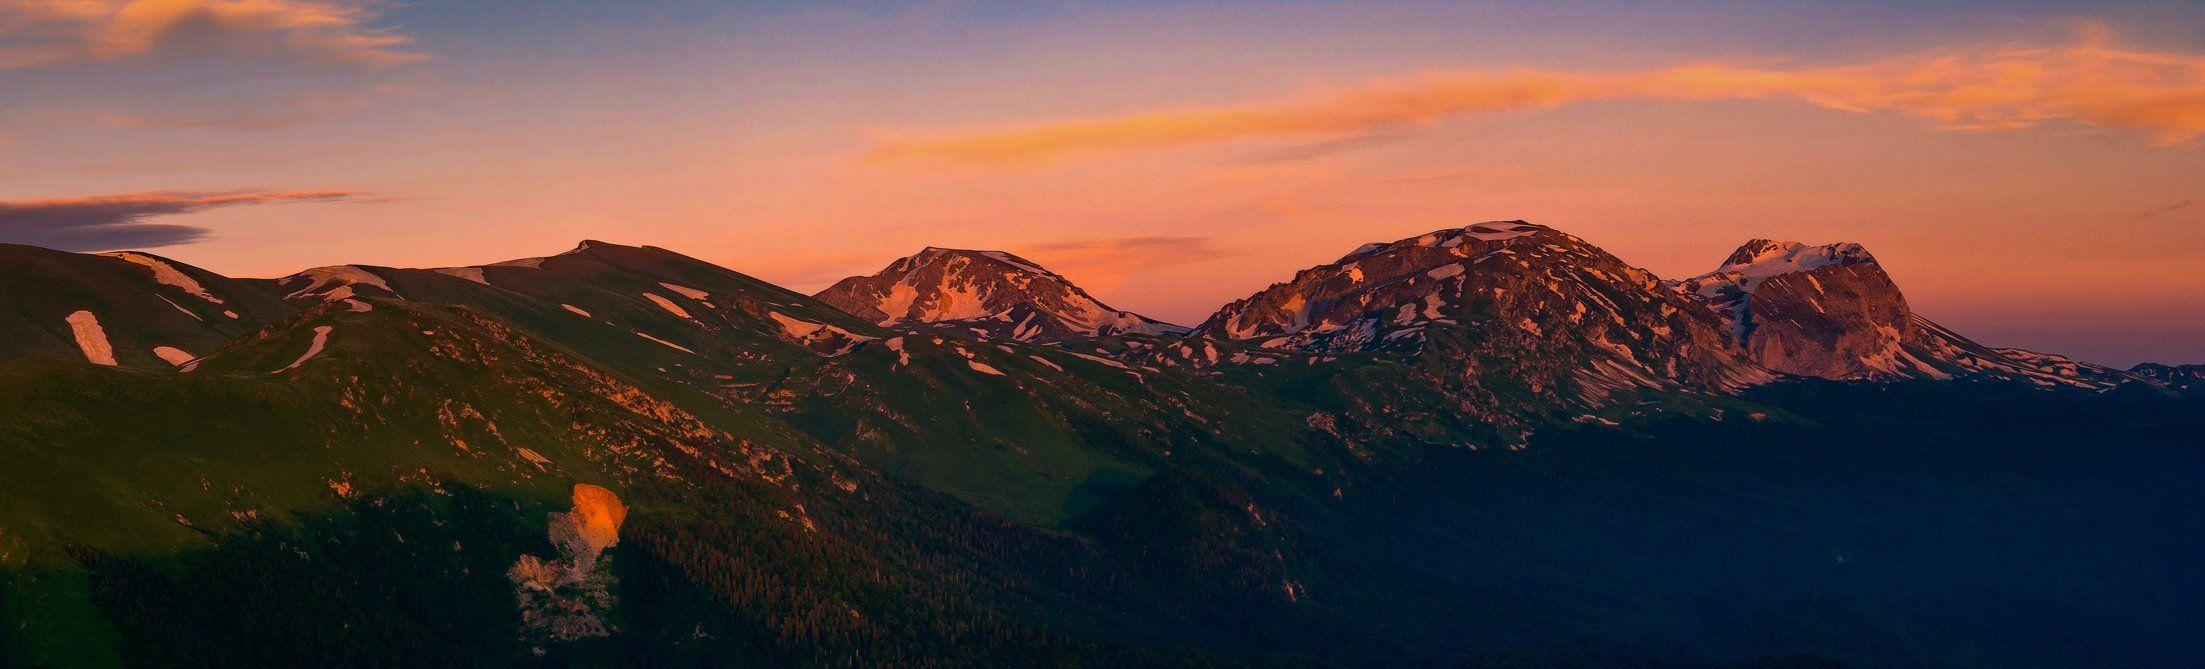 горы, , кавказ, лаго-наки, оштен, пшехо-су, фишт, вид, черногор, нагой, -чук, фёдор